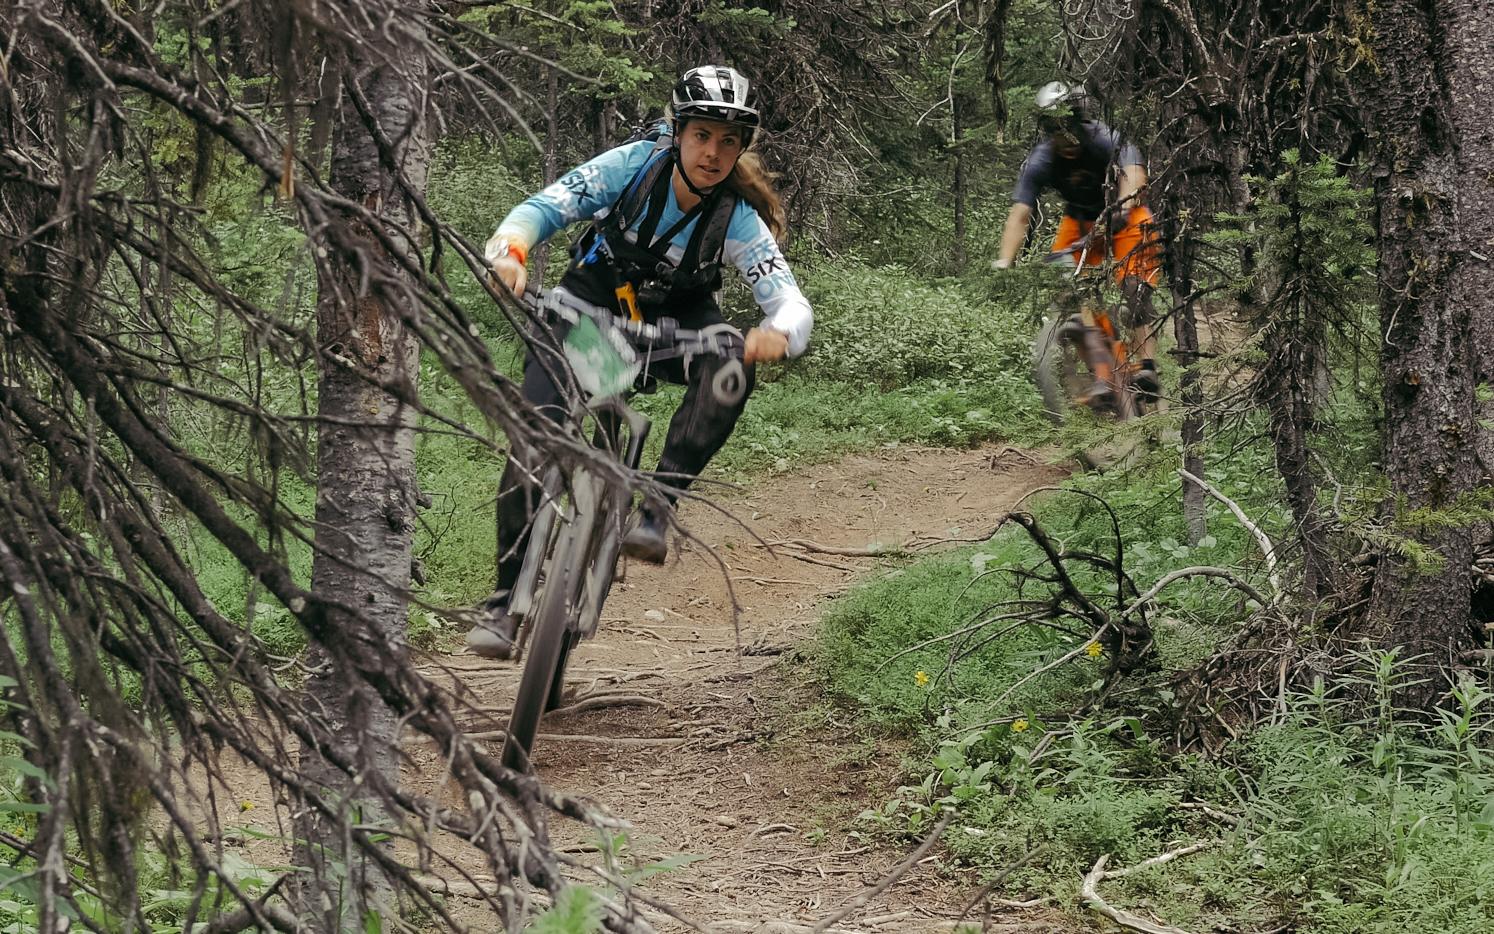 Fresh, amazing trails. Traharn loved the Trans BC Enduro! Credit: Garret Van Swearingen